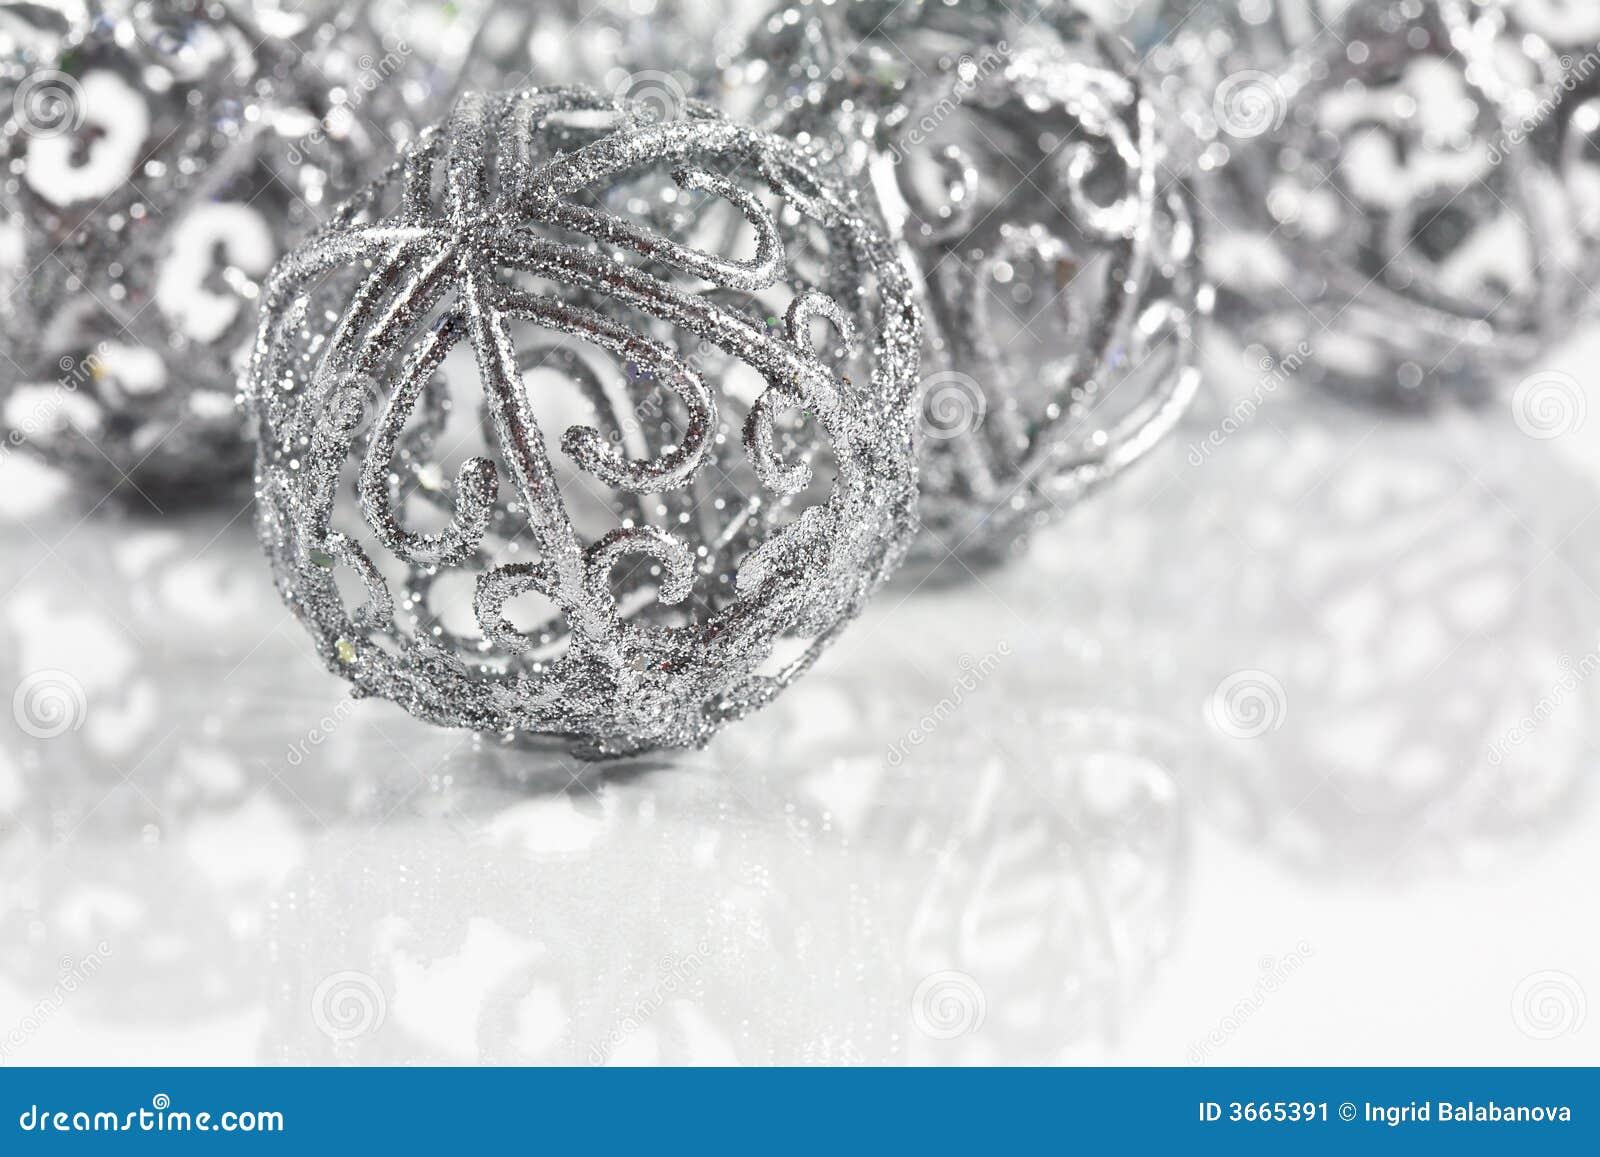 Silver balls on white background